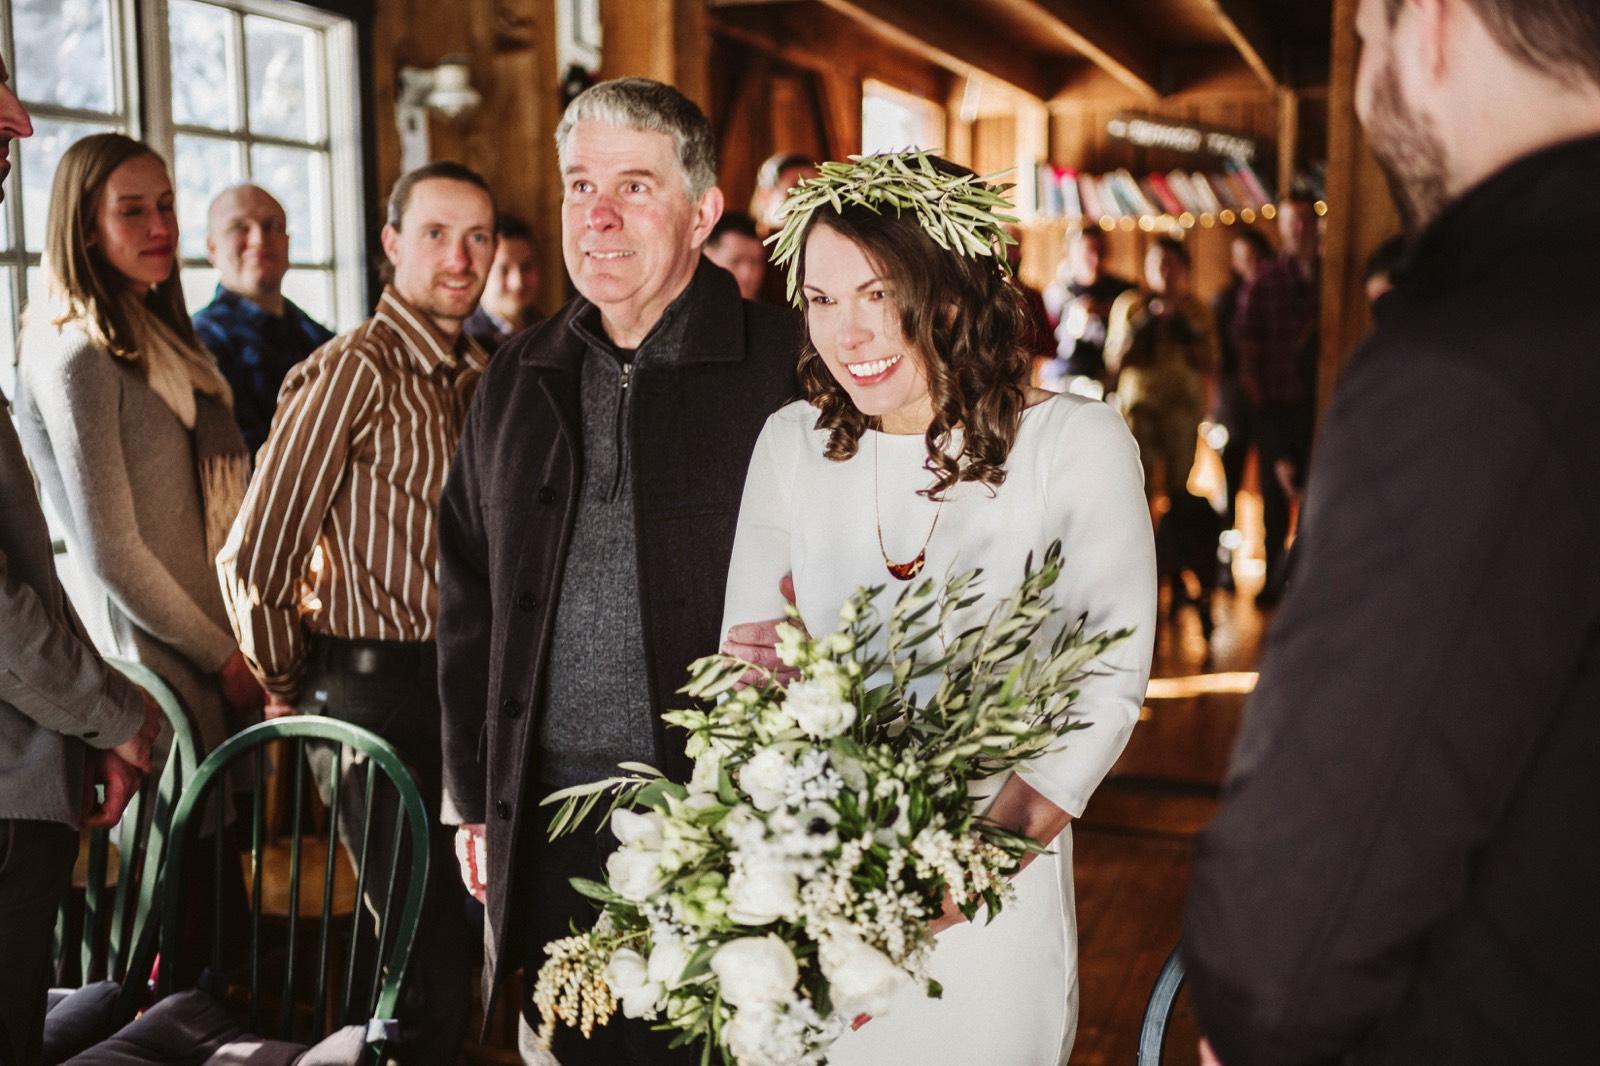 alpine-lakes-high-camp-winter-wedding-29 ALPINE LAKES HIGH CAMP WEDDING